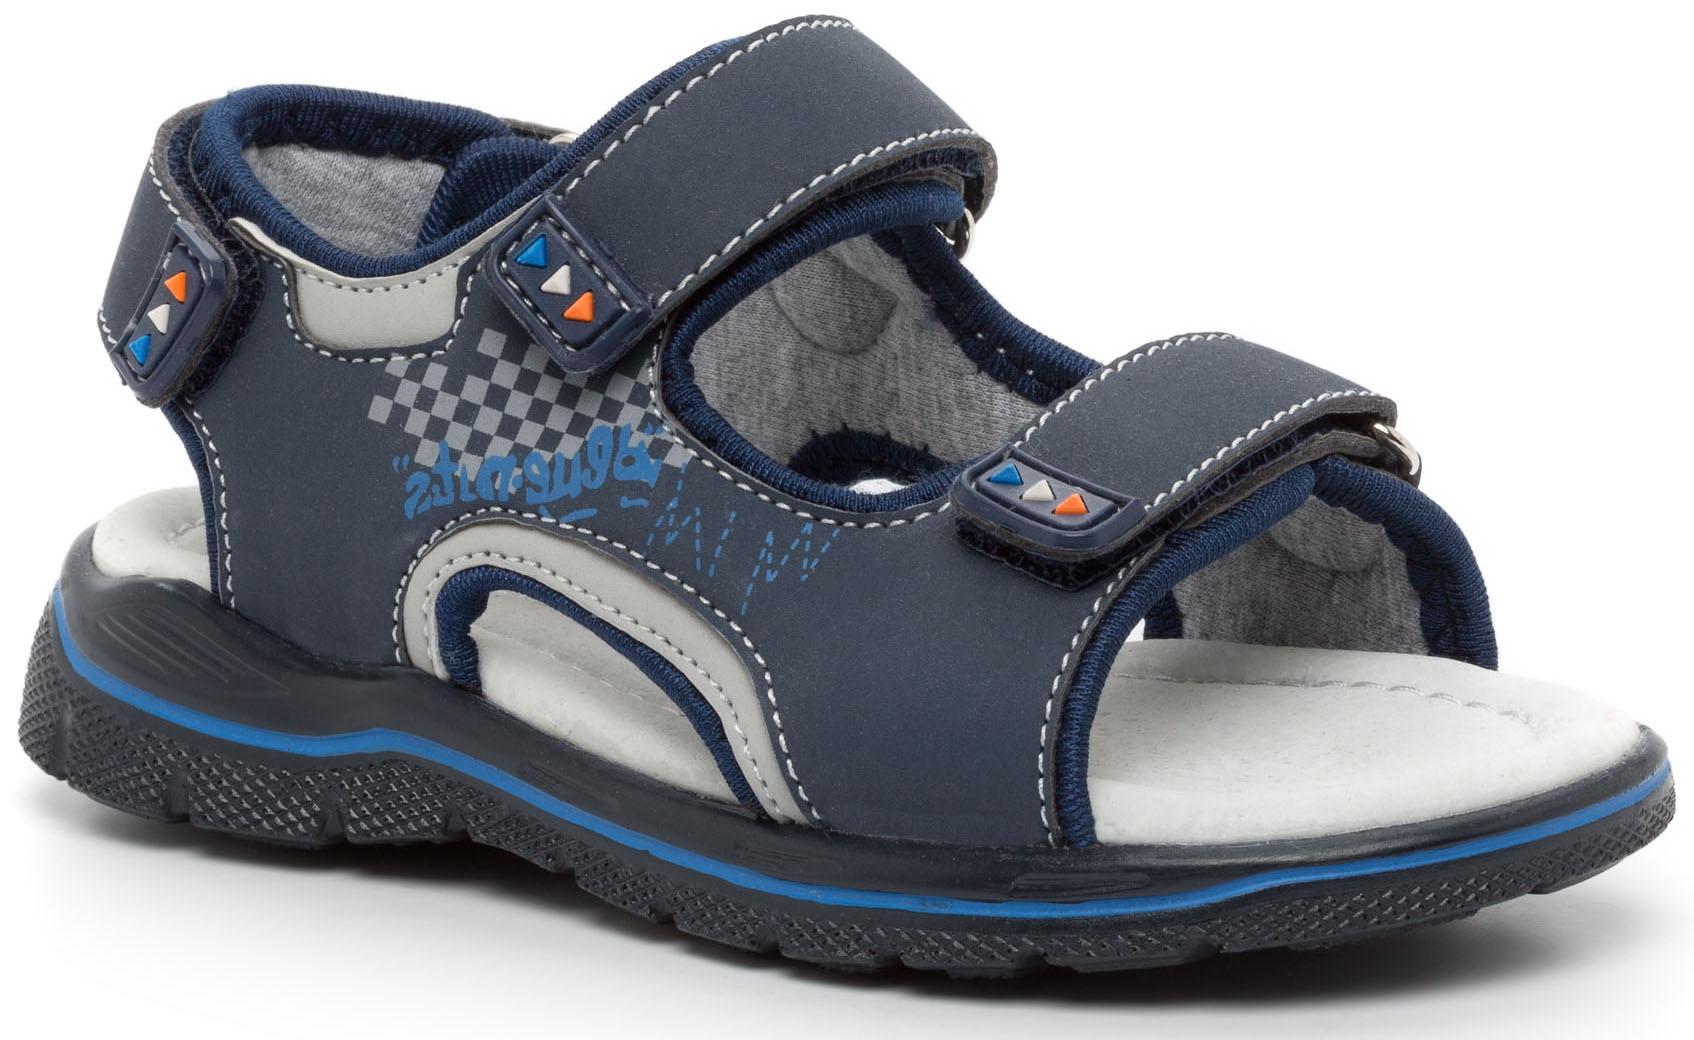 Босоножки Barkito Туфли летние для мальчика Barkito, темно-синие